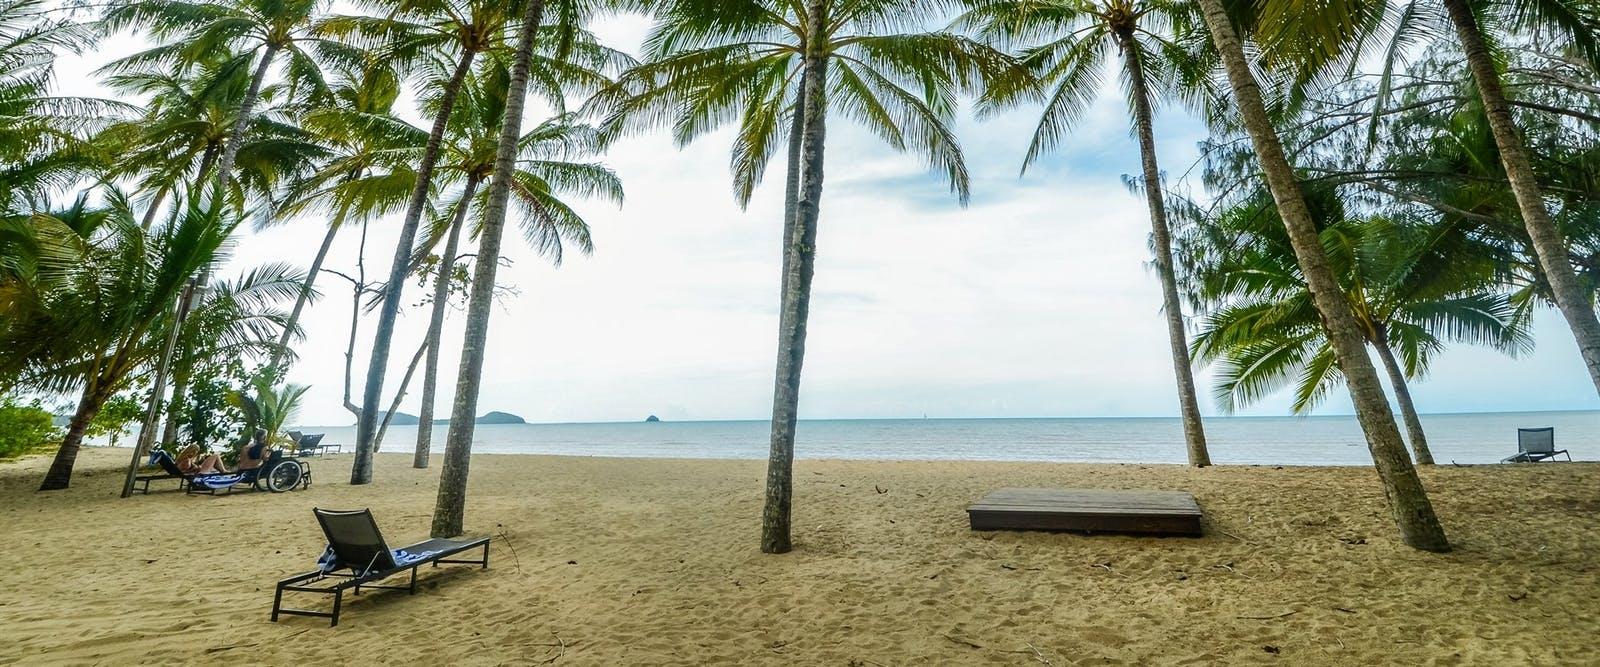 Kewarra Beach Resort And Spa Queensland Hotels Australia